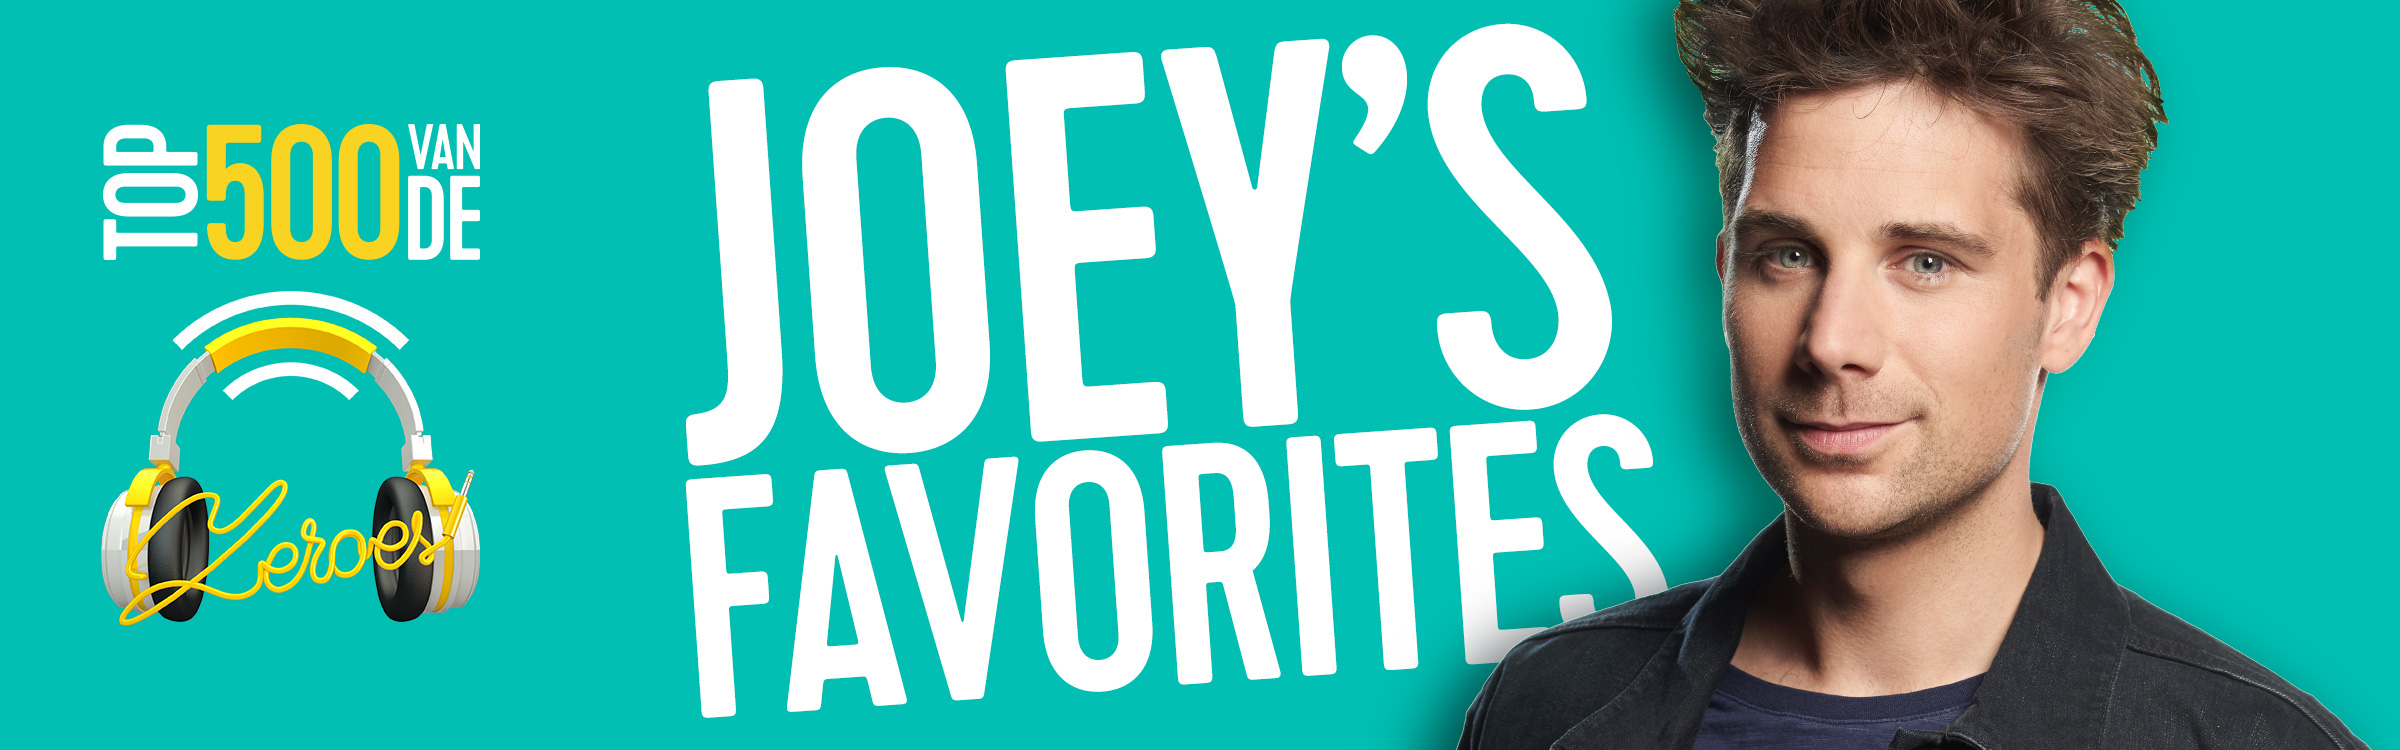 Joey favo header